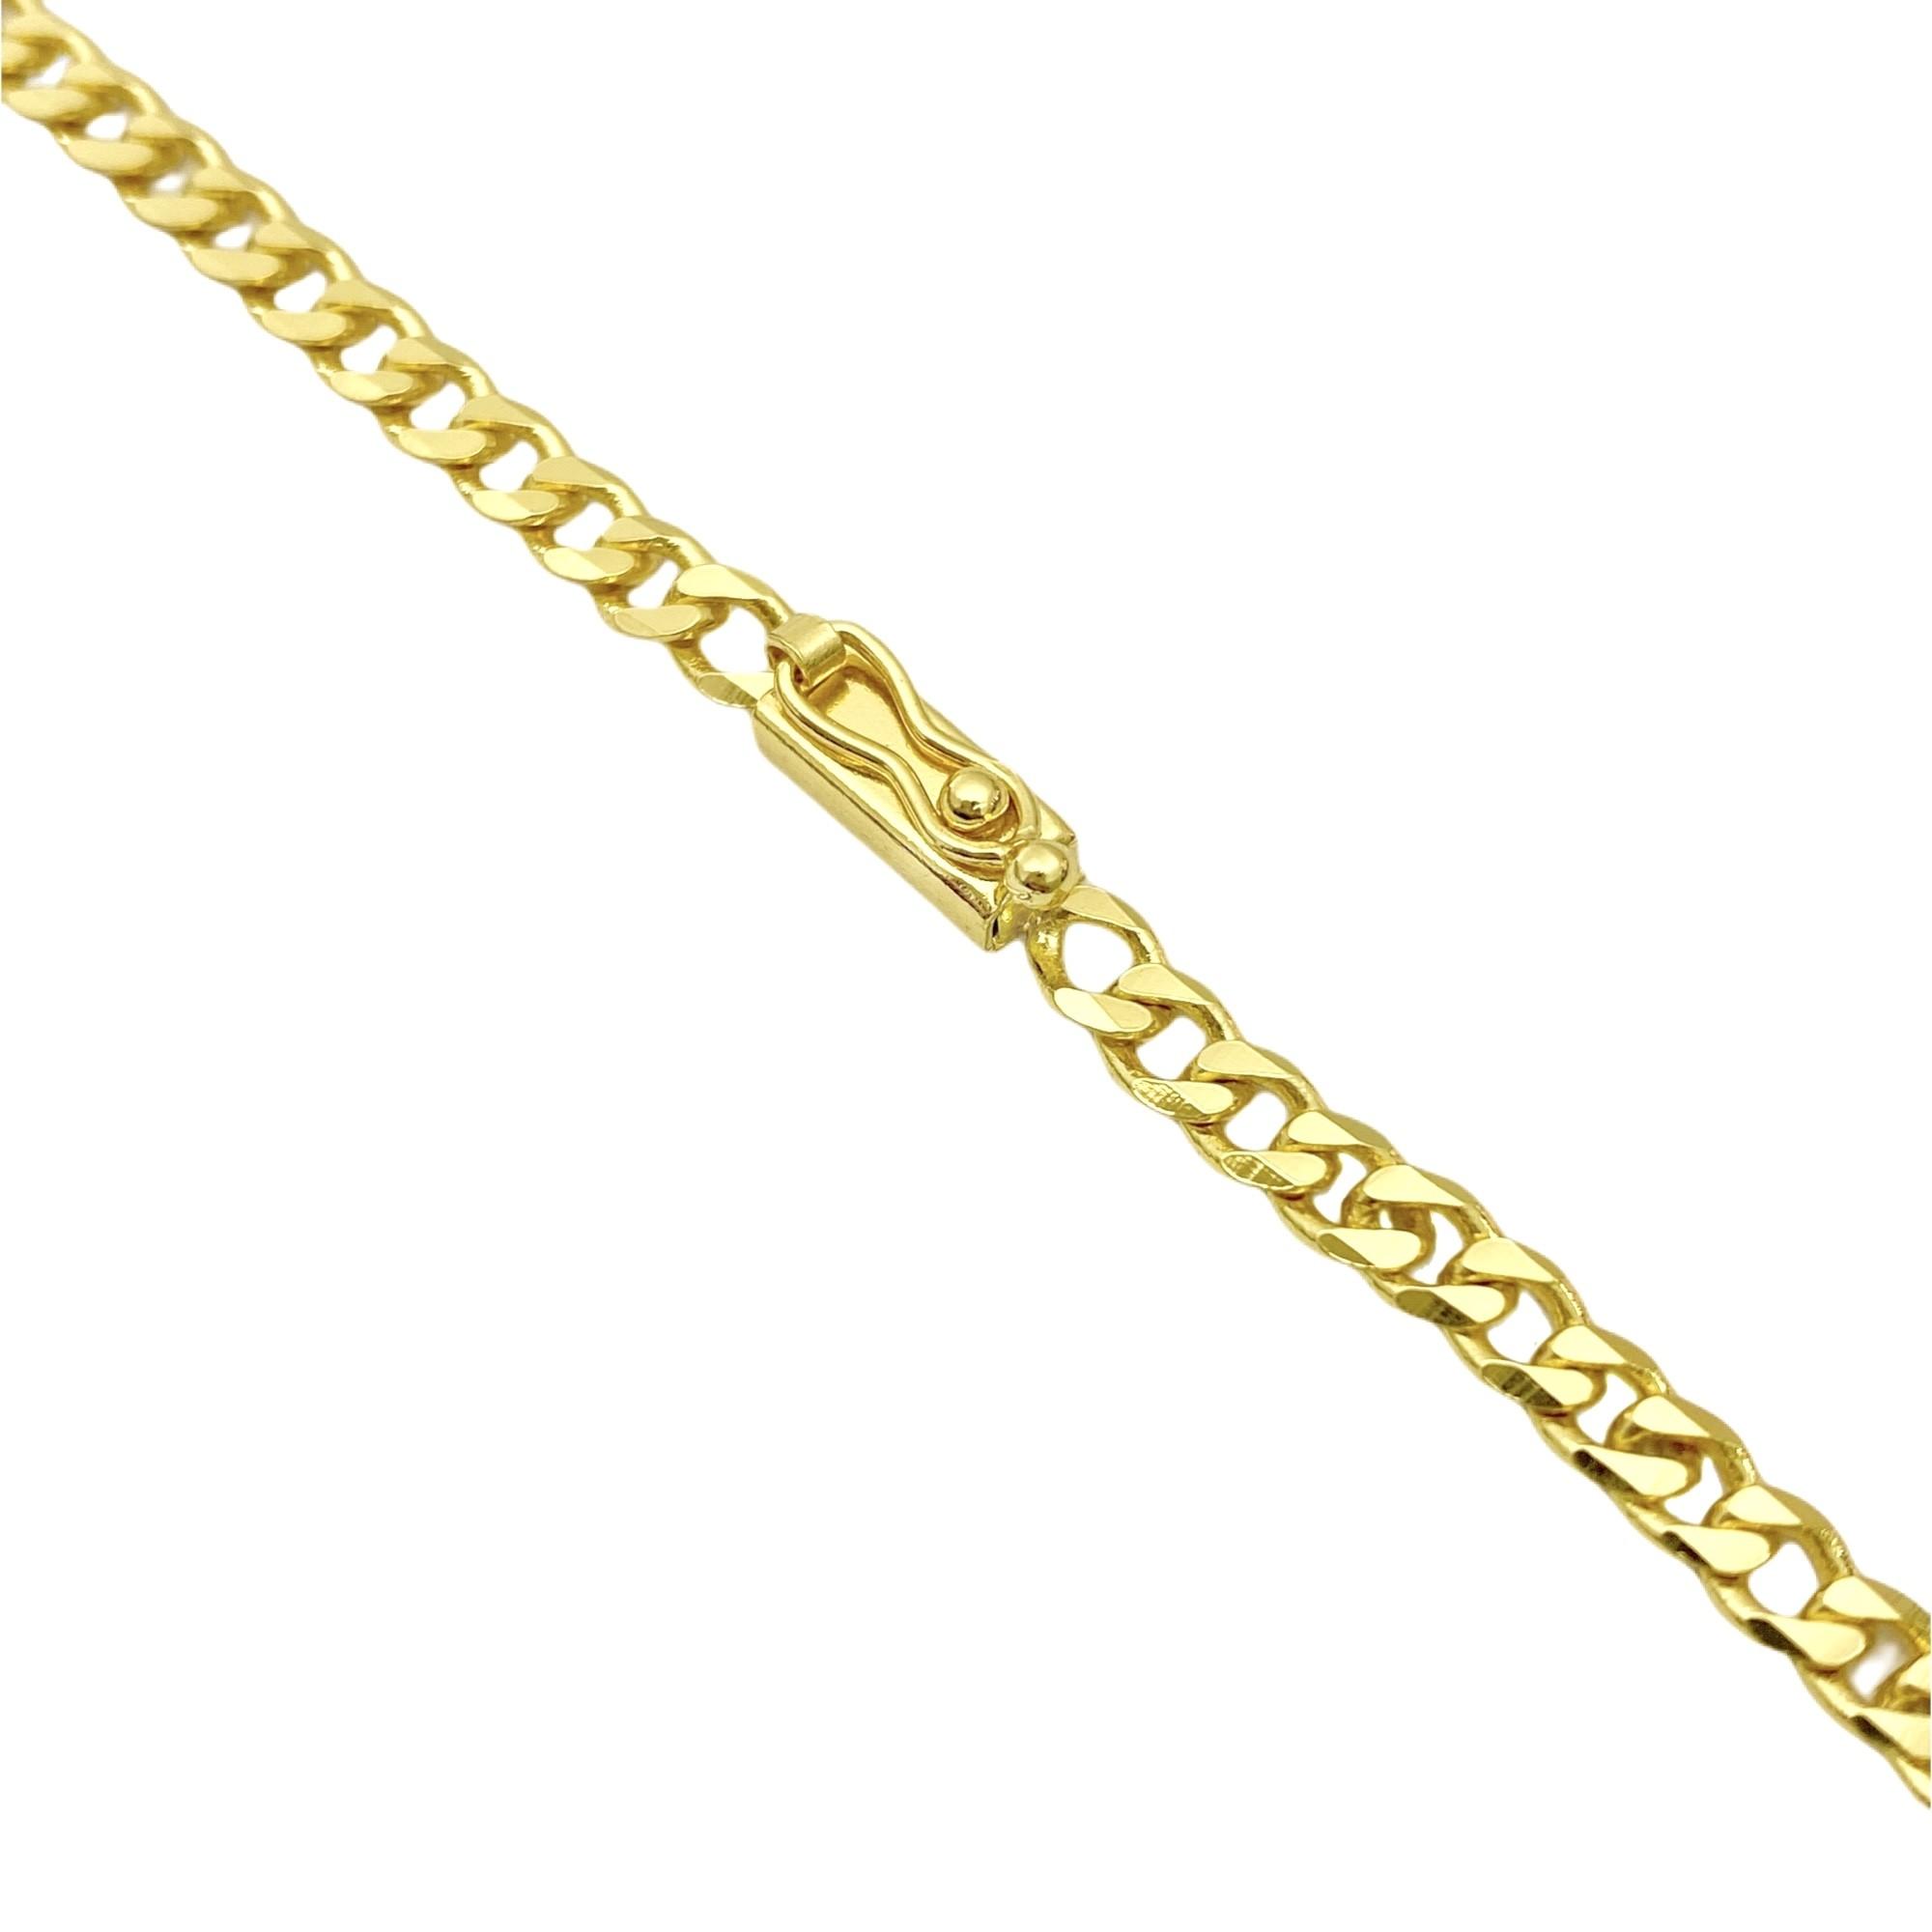 Corrente Grumet 4mm 60cm (14,5g) (Fecho Gaveta) (Banho Ouro 24k)